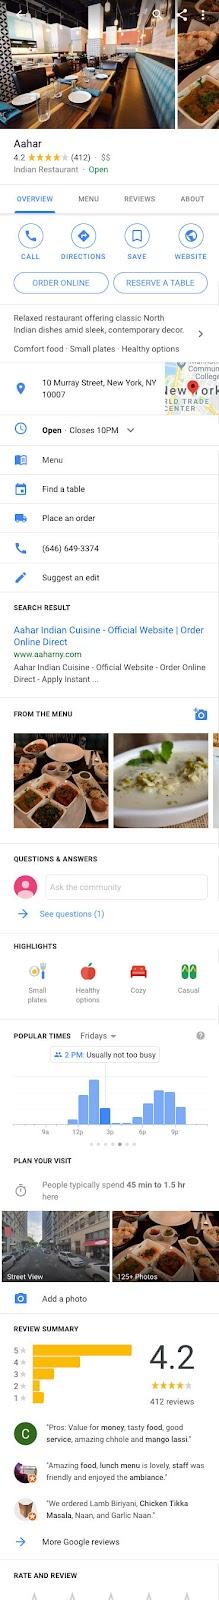 google my business for restaurants listing